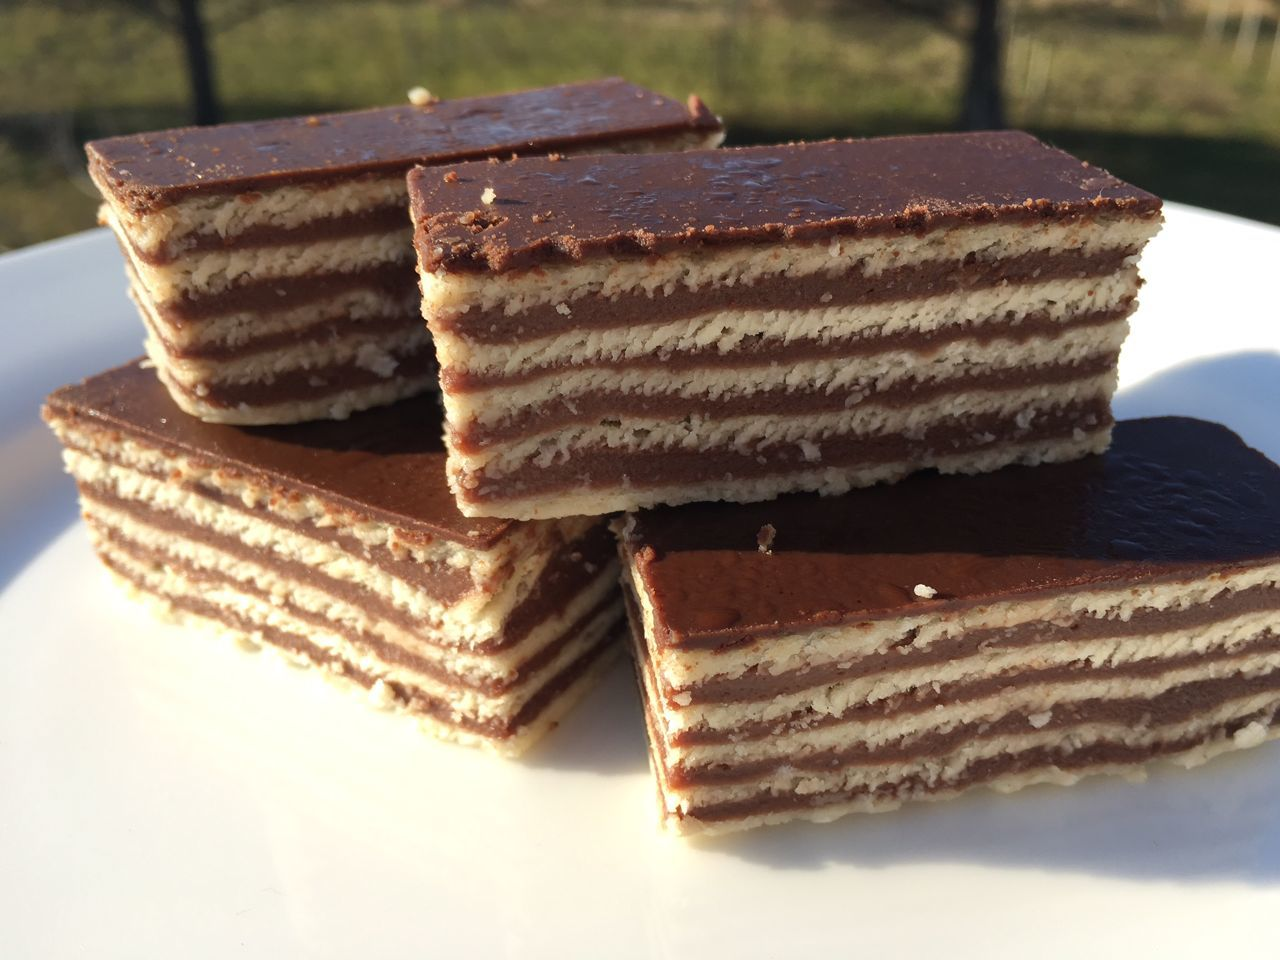 Croatian Chocolate Cake Recipes